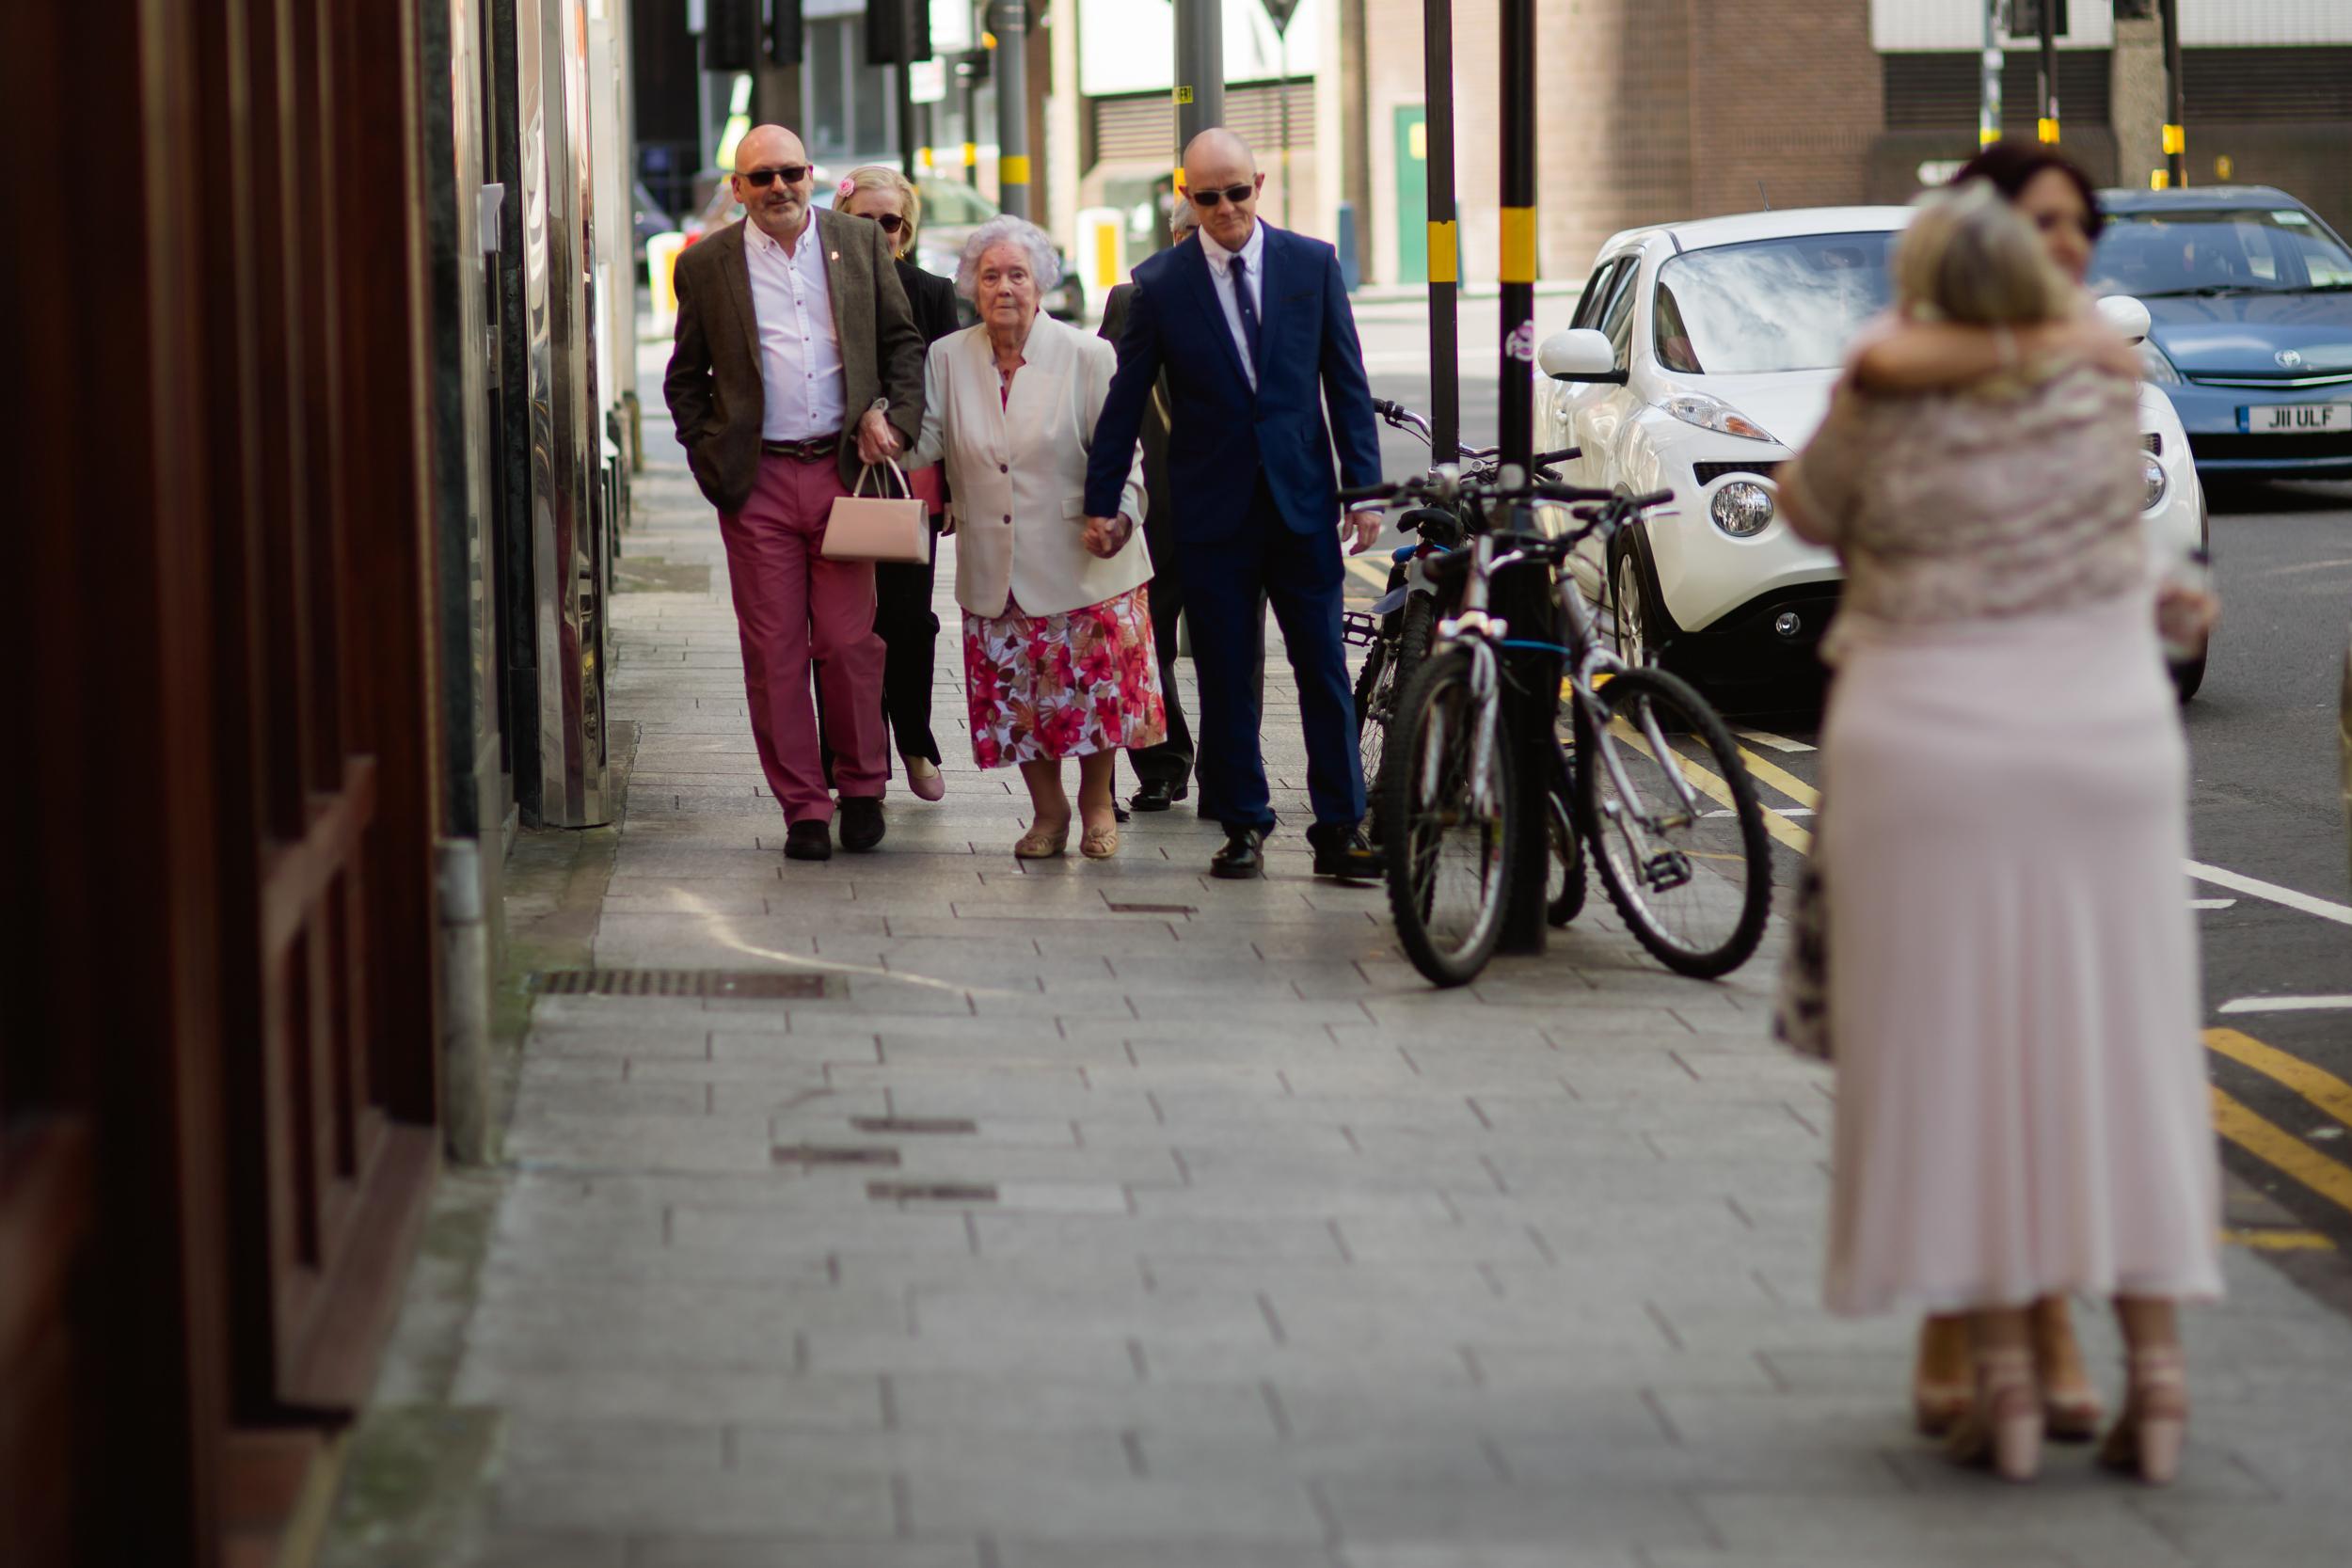 Grandma arrives at the wedding